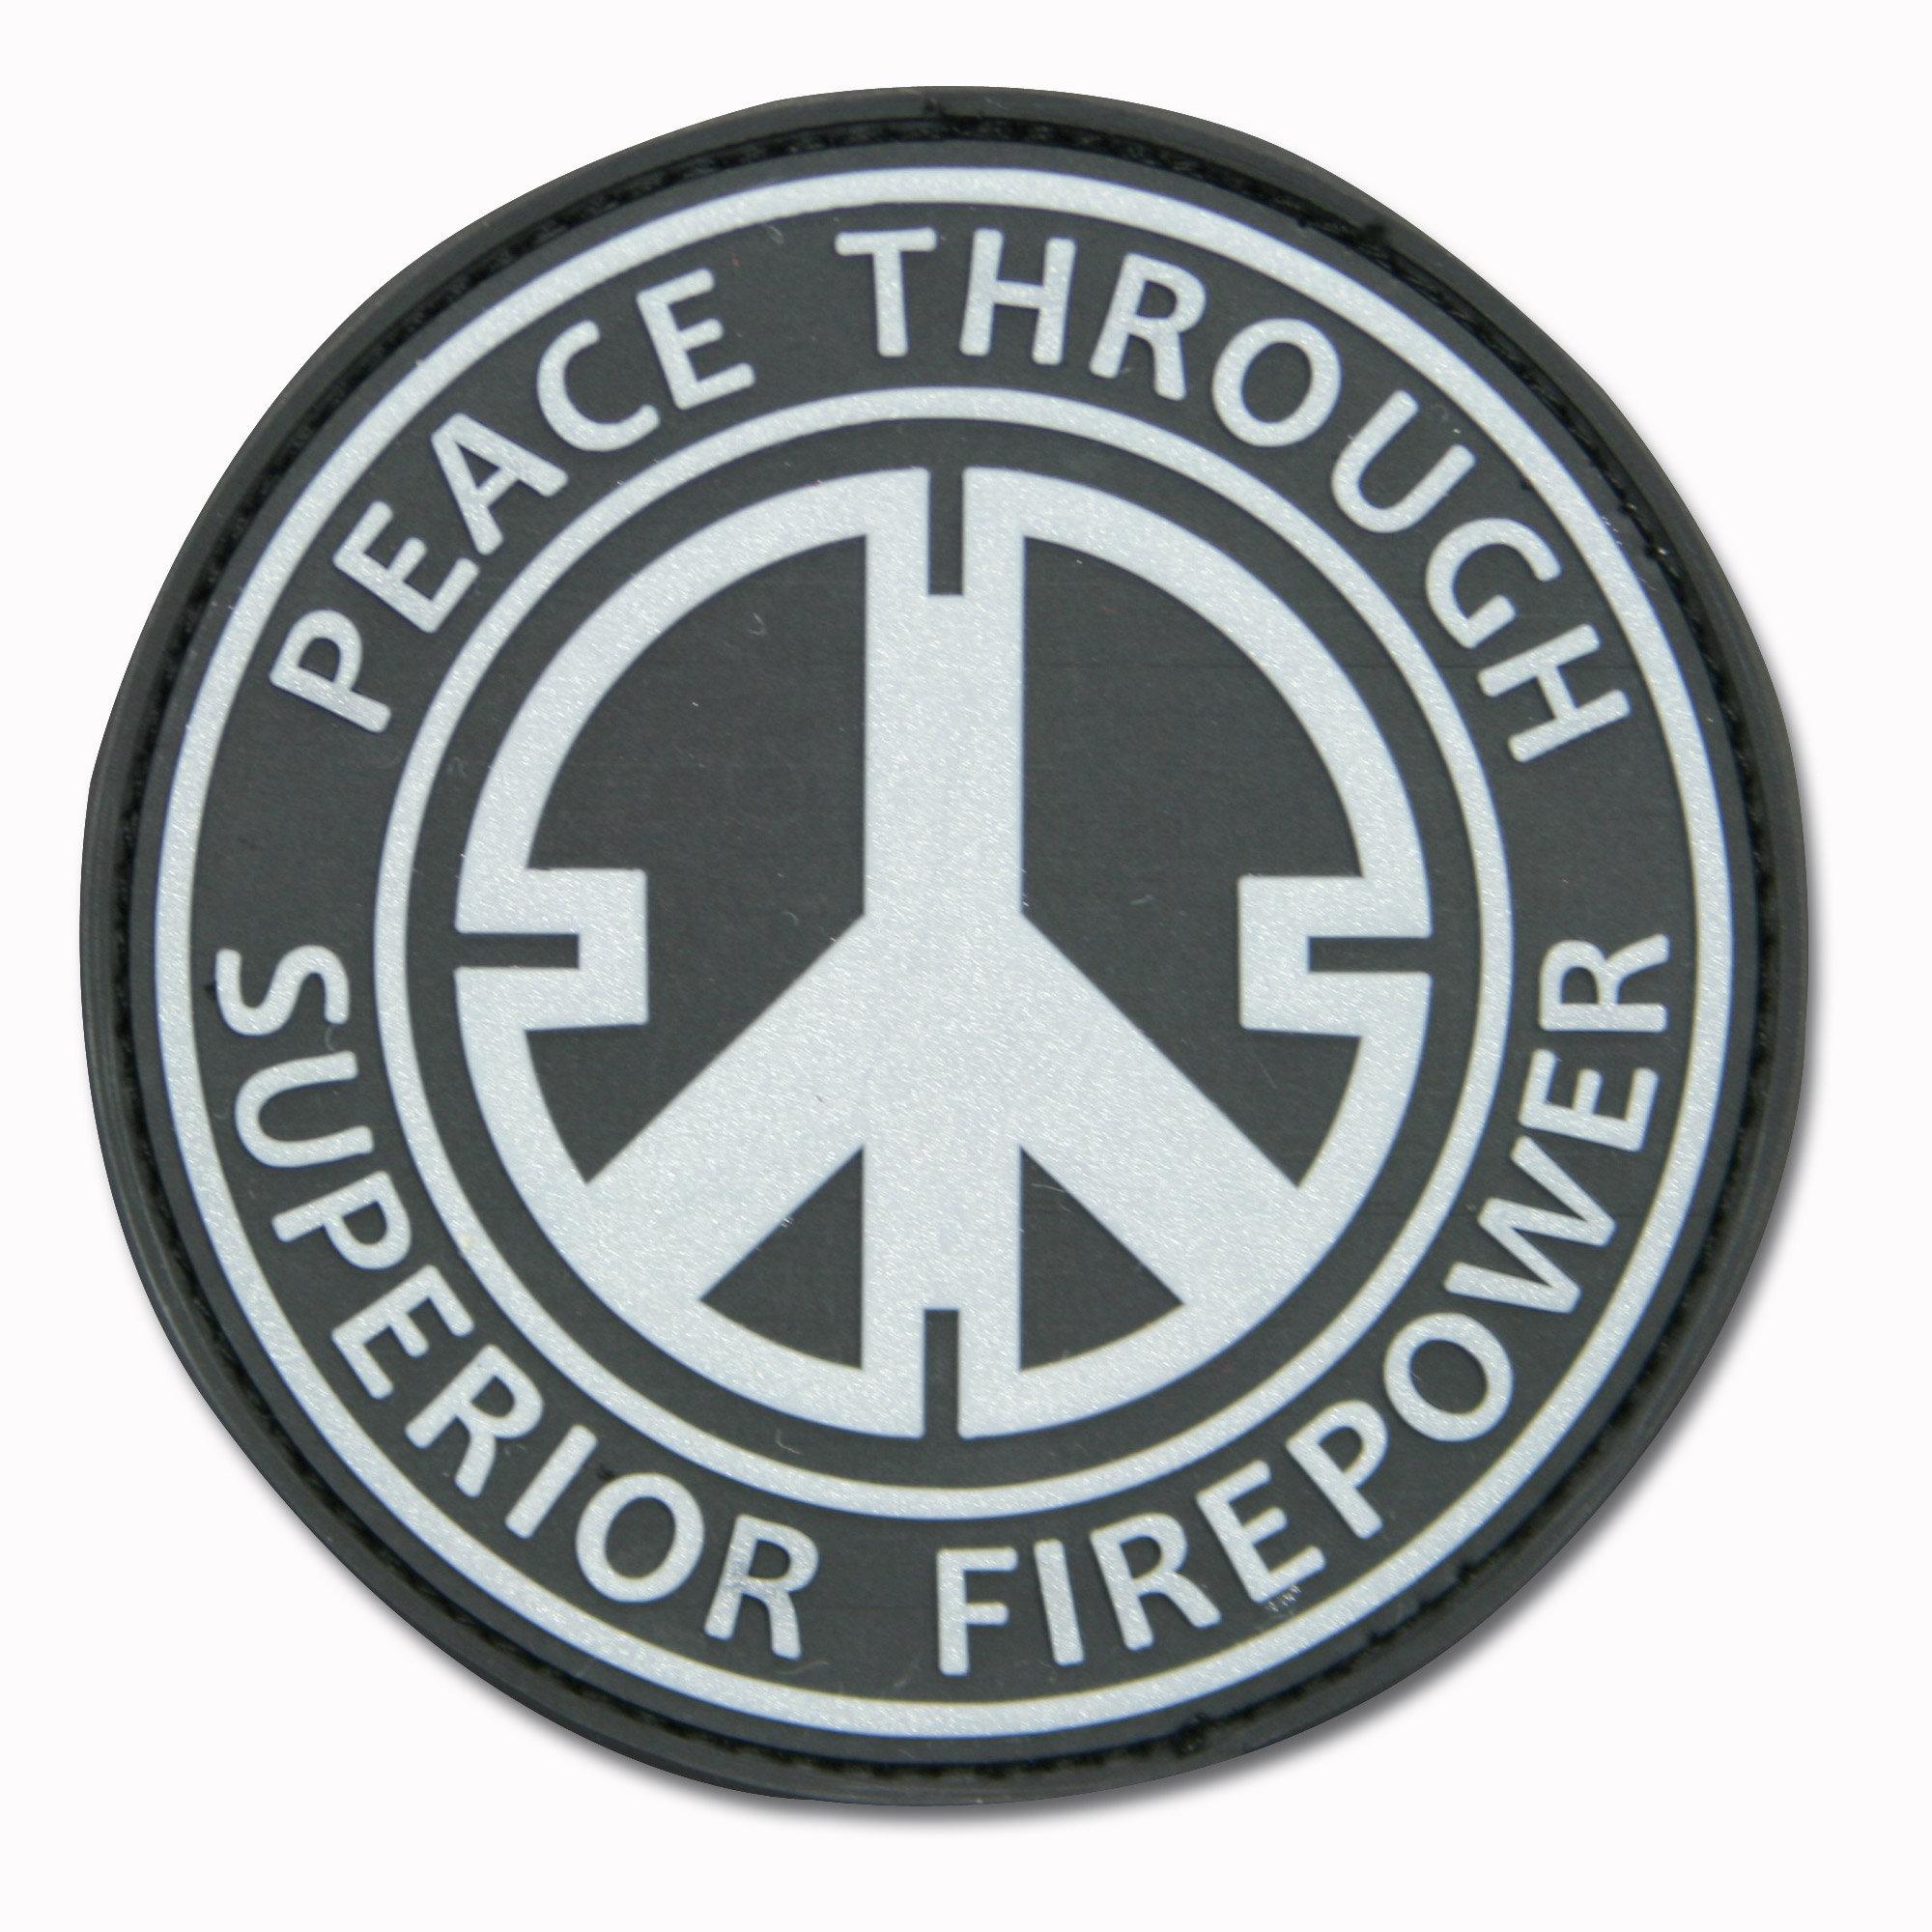 3D-Patch Peace Through Superior Firepower black